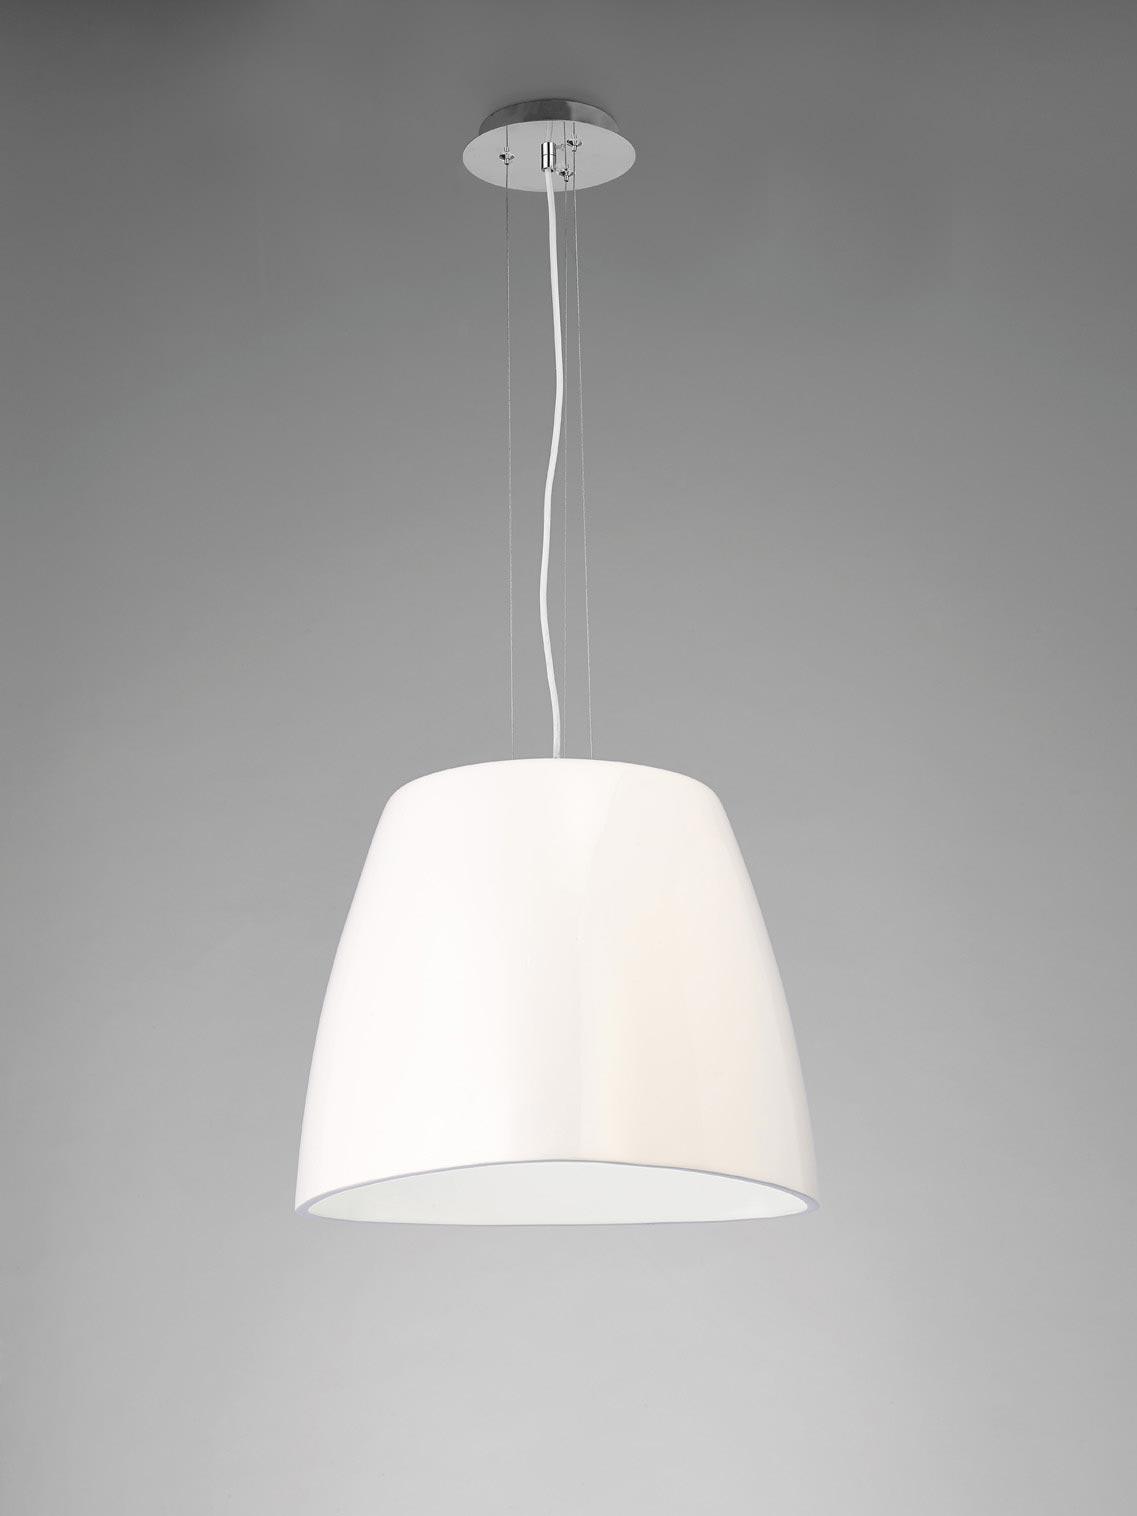 Lámpara colgante blanca grande TRIANGLE